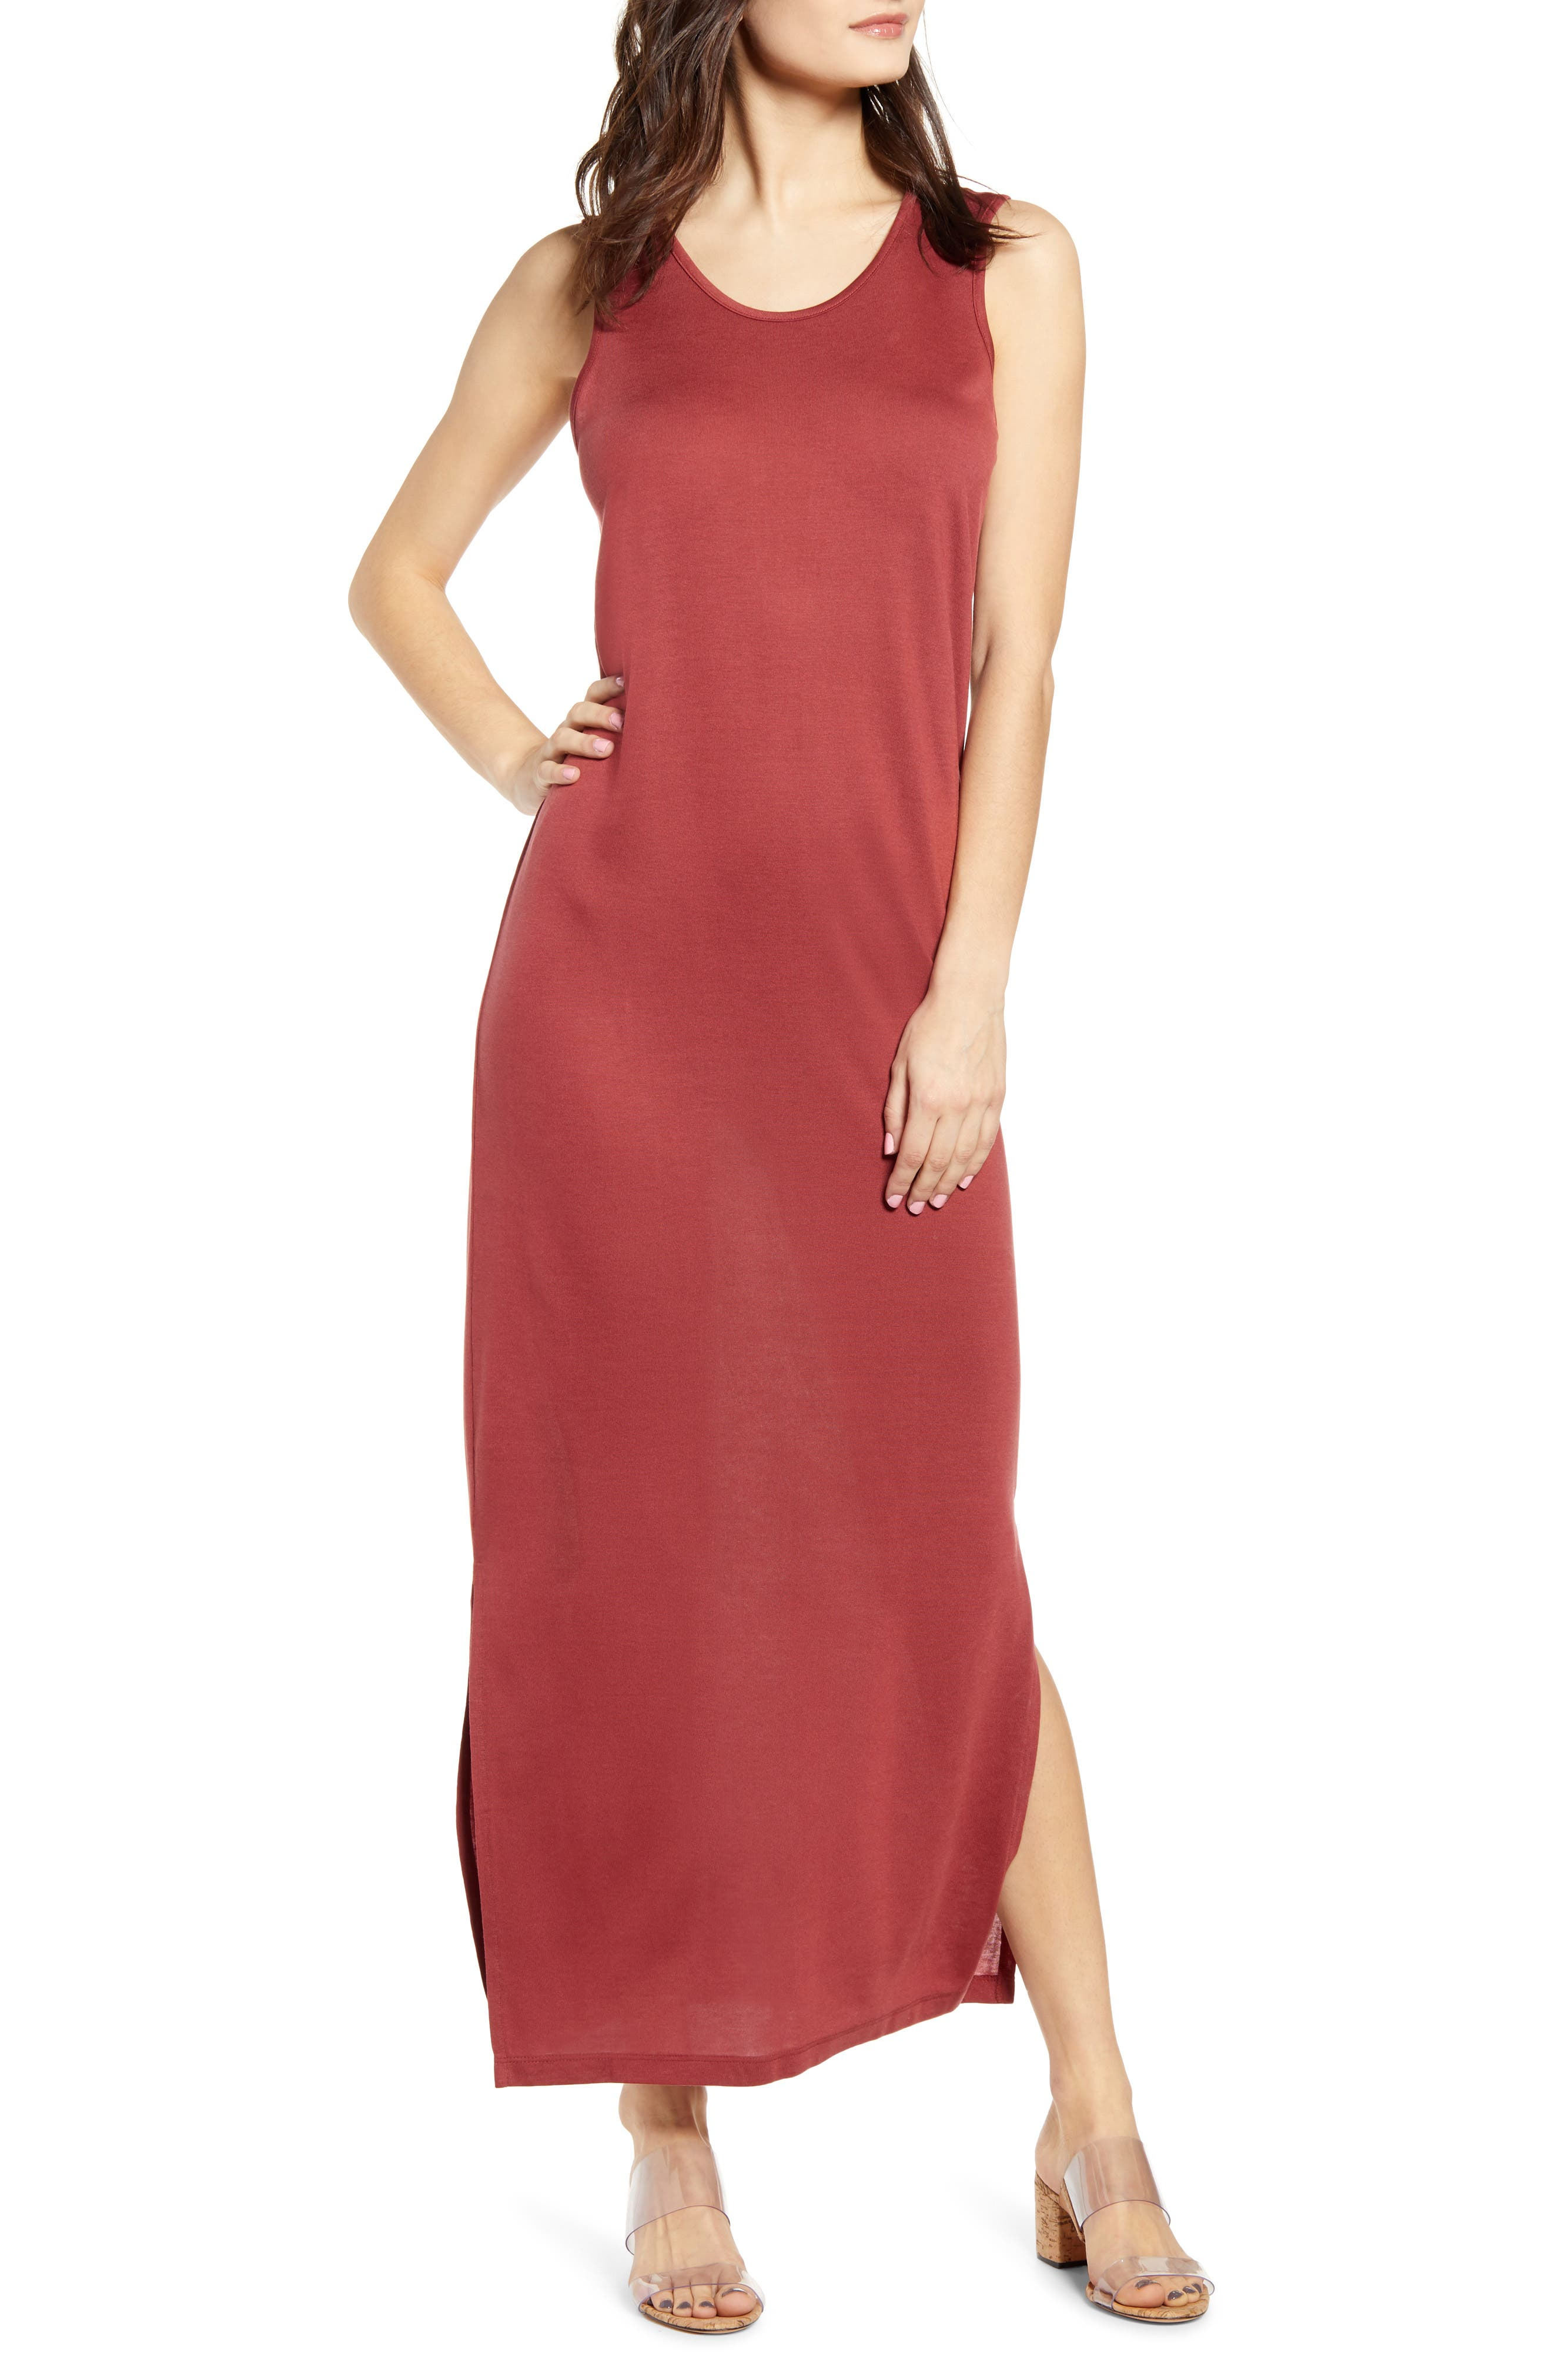 Vero Moda Dina Maxi Dress, Brown